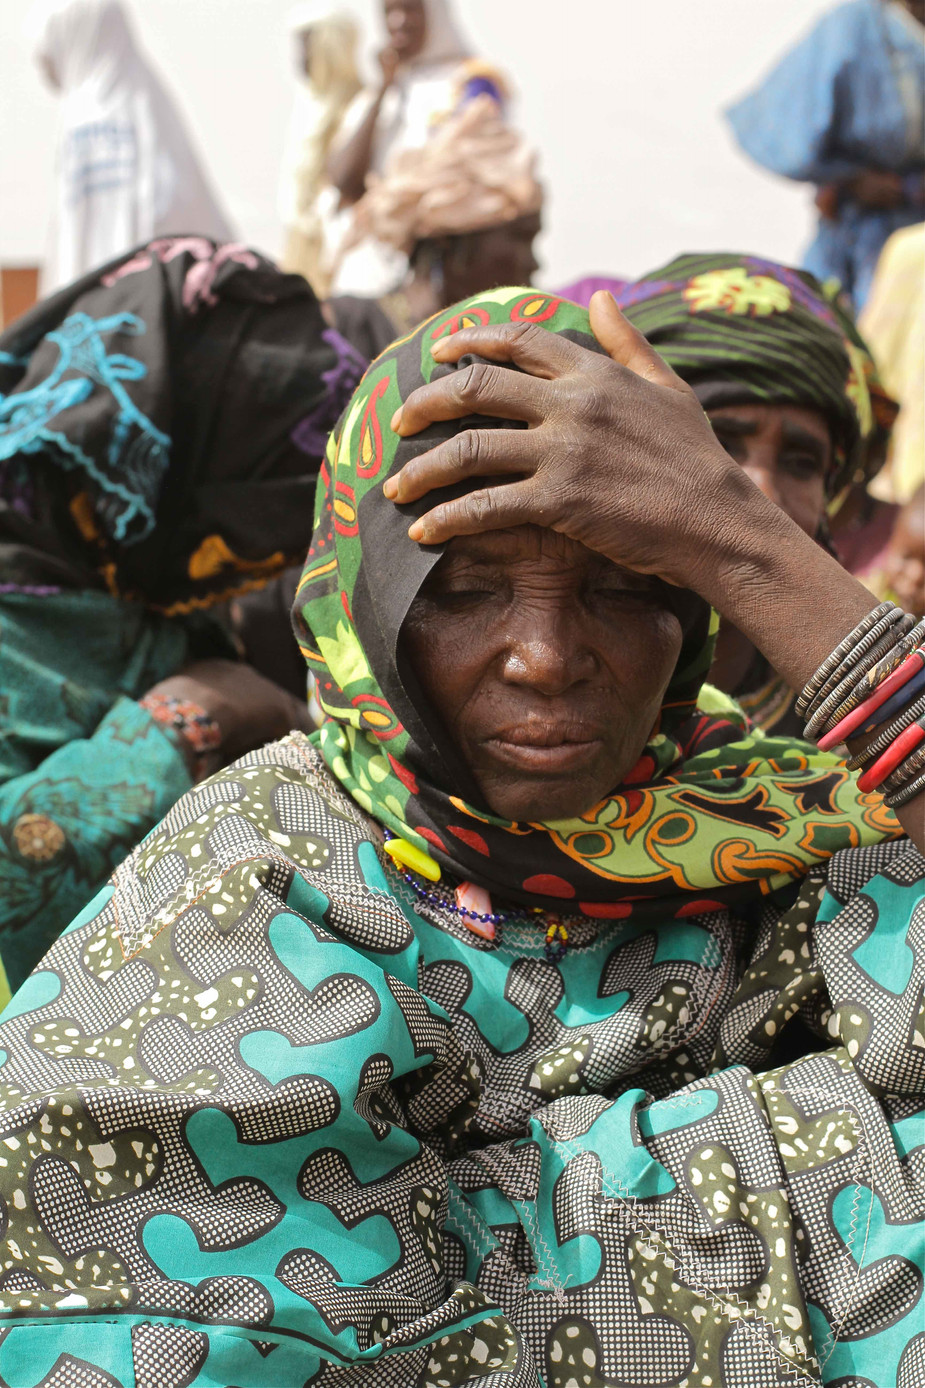 refugee waits for food distribution .jpg